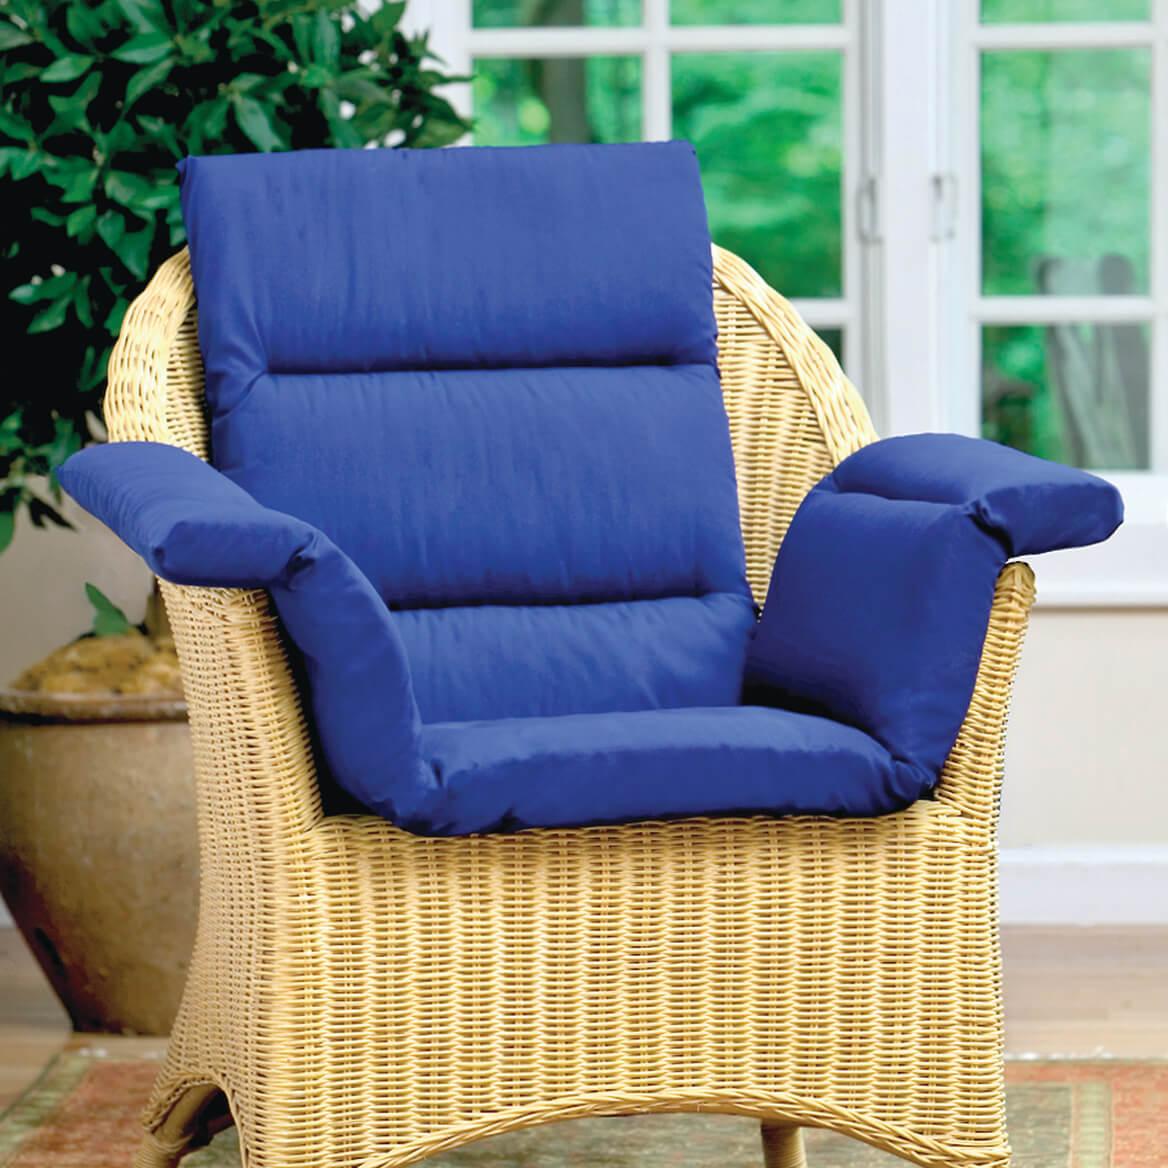 Orthopaedic Prayer Rug: Pressure Reducing Chair Cushion